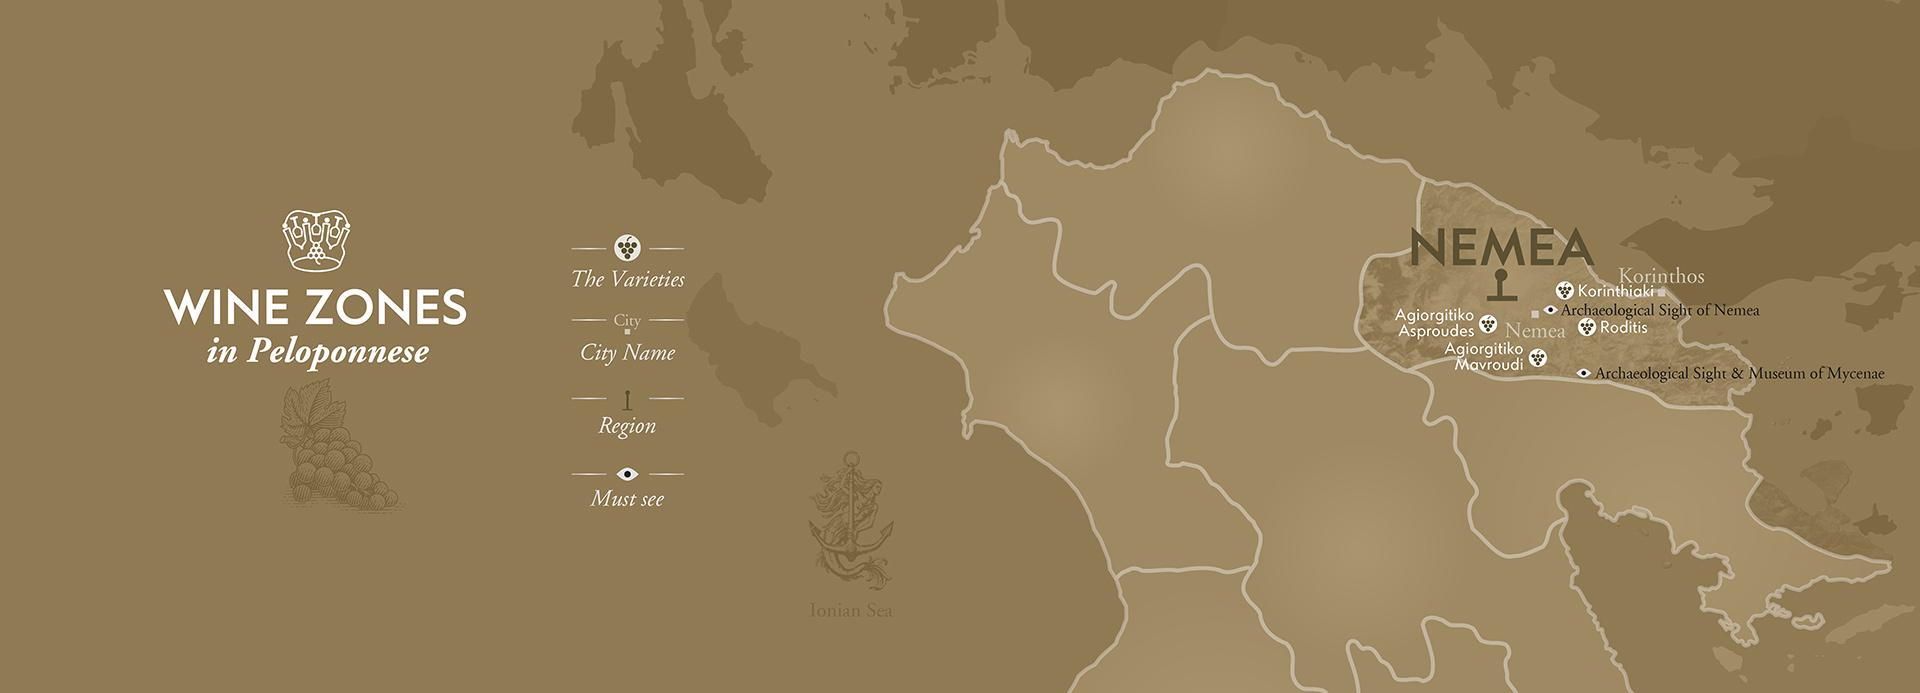 Nemea Wineries Map by The Wine Connoisseurs